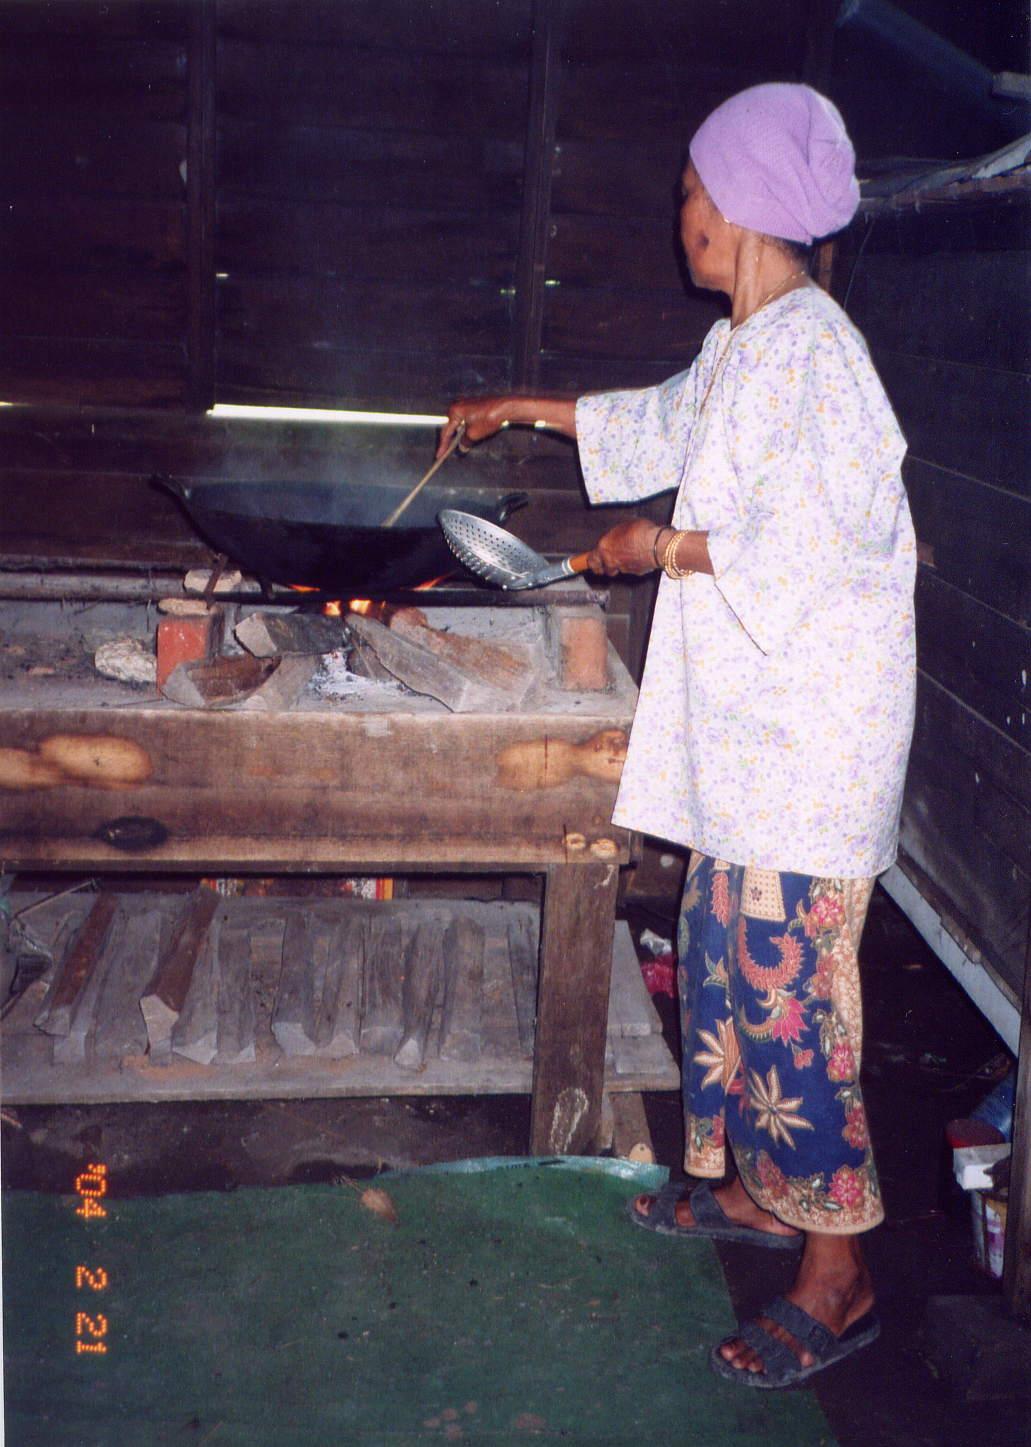 Buluh Kecil Dijadikan Peniup Untuk Menyemarn Pembakaran